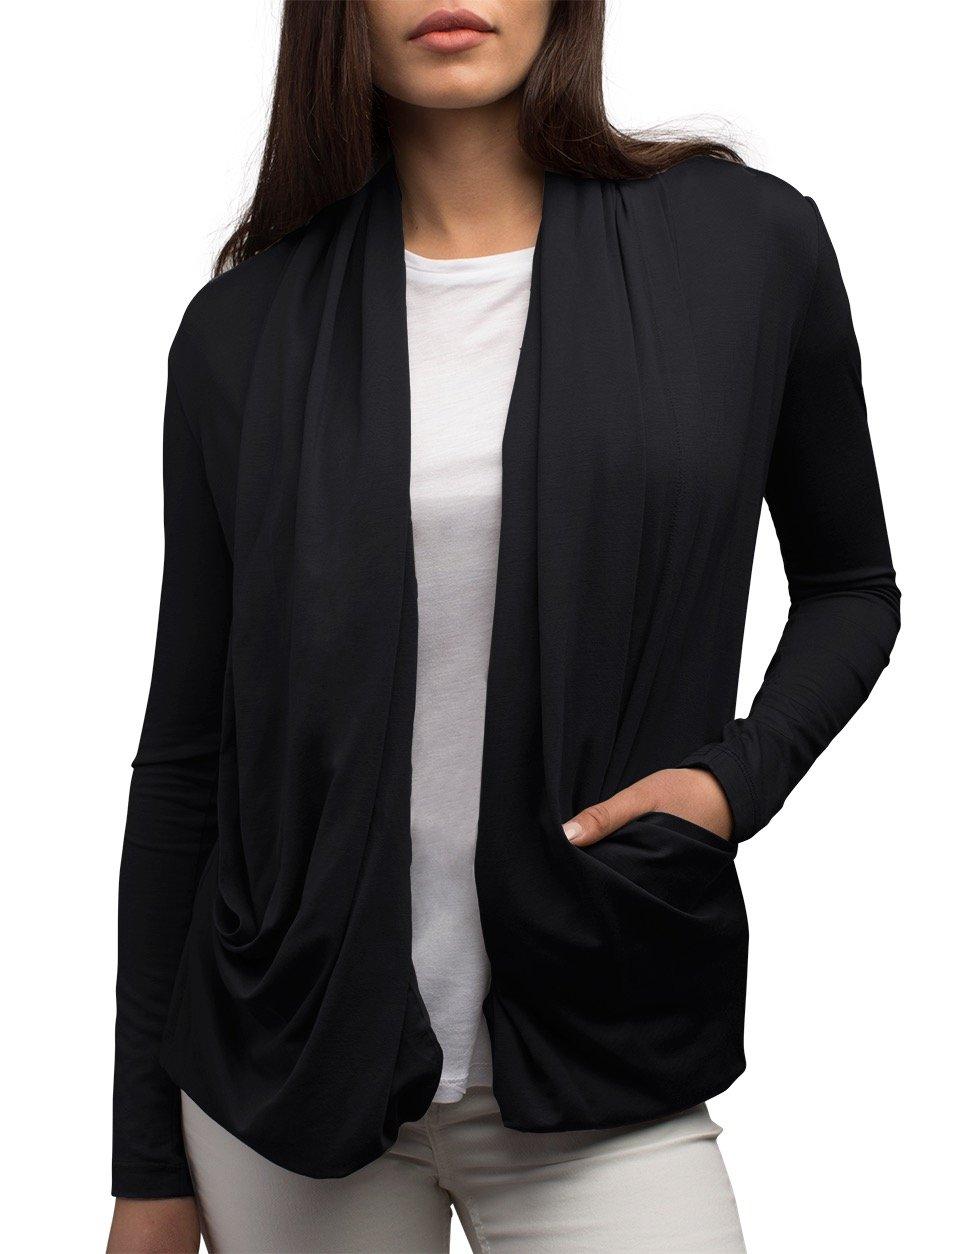 SCOTTeVEST Maddie Cardigan - 4 Pockets - Travel Clothing, Pickpocket Proof BLK M